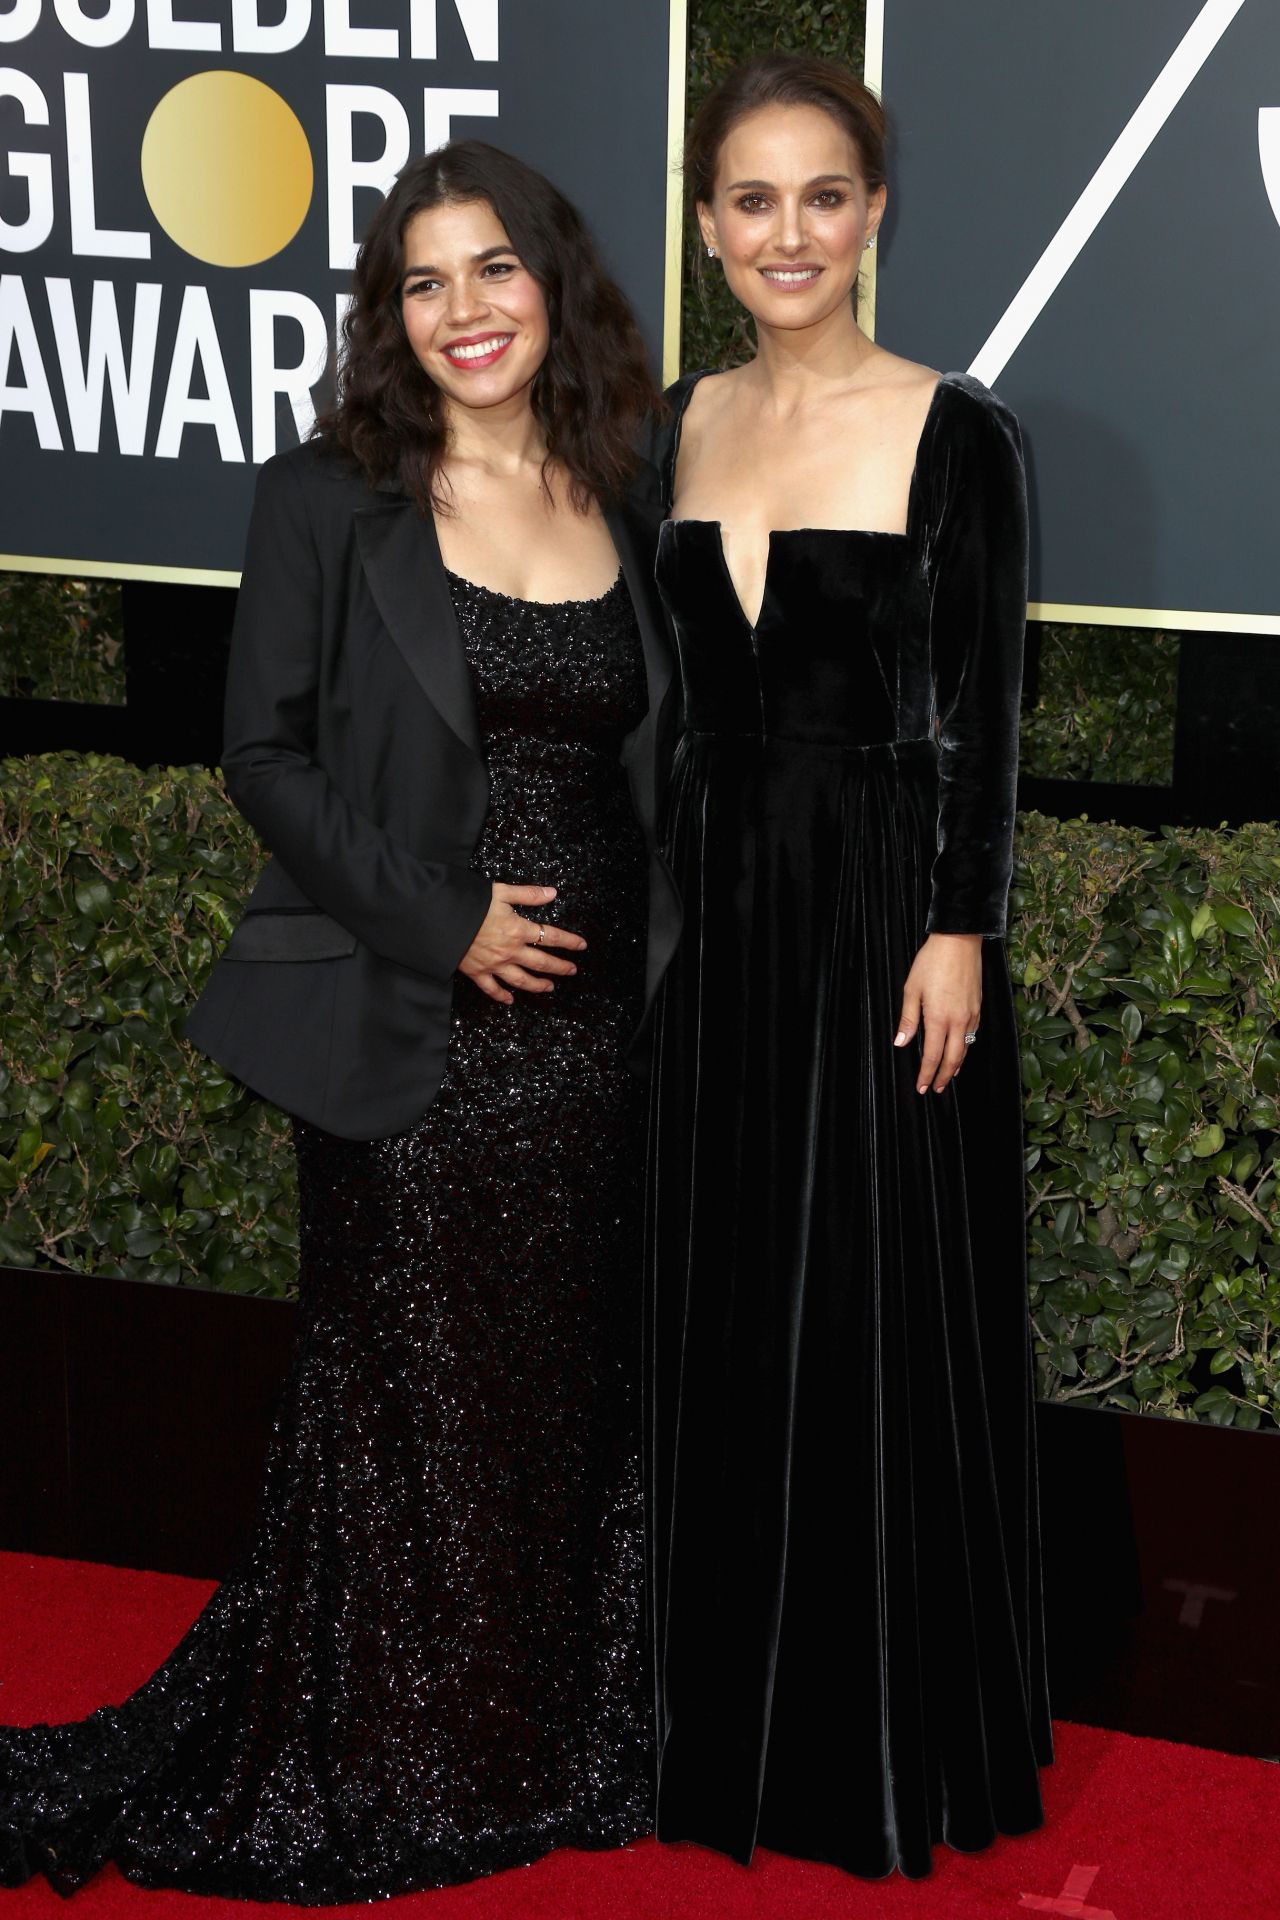 http://celebmafia.com/wp-content/uploads/2018/01/natalie-portman-golden-globe-awards-2018-in-beverly-hills-0.jpg